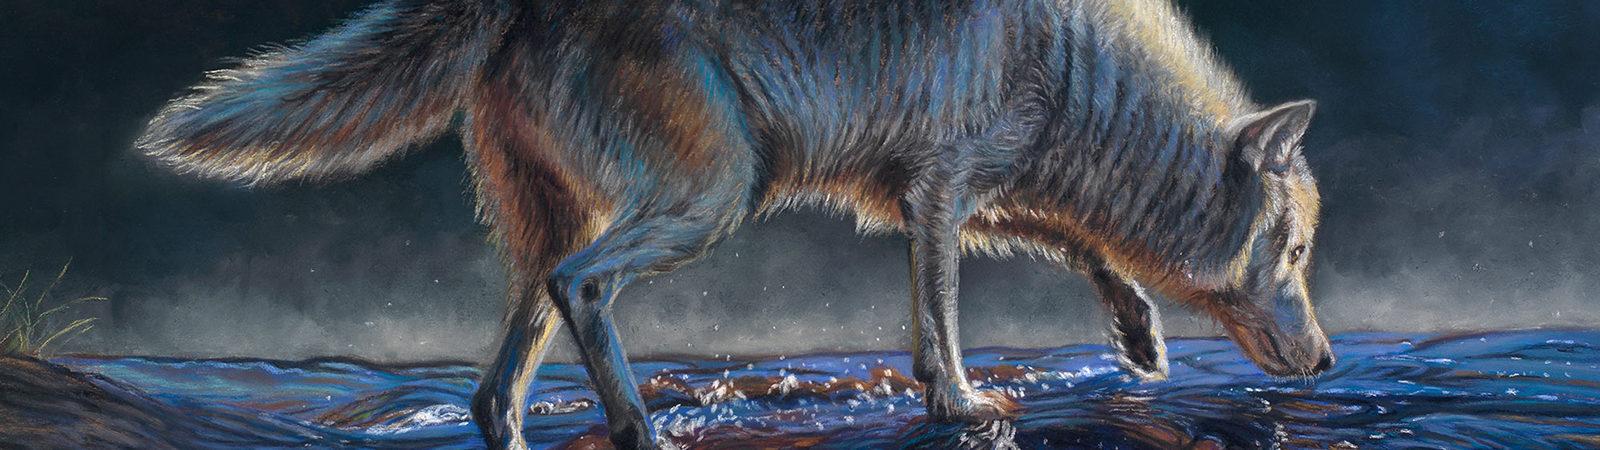 Wolf Awareness Week 2020 Winning Poster Art by Deborah LaFogg Docherty